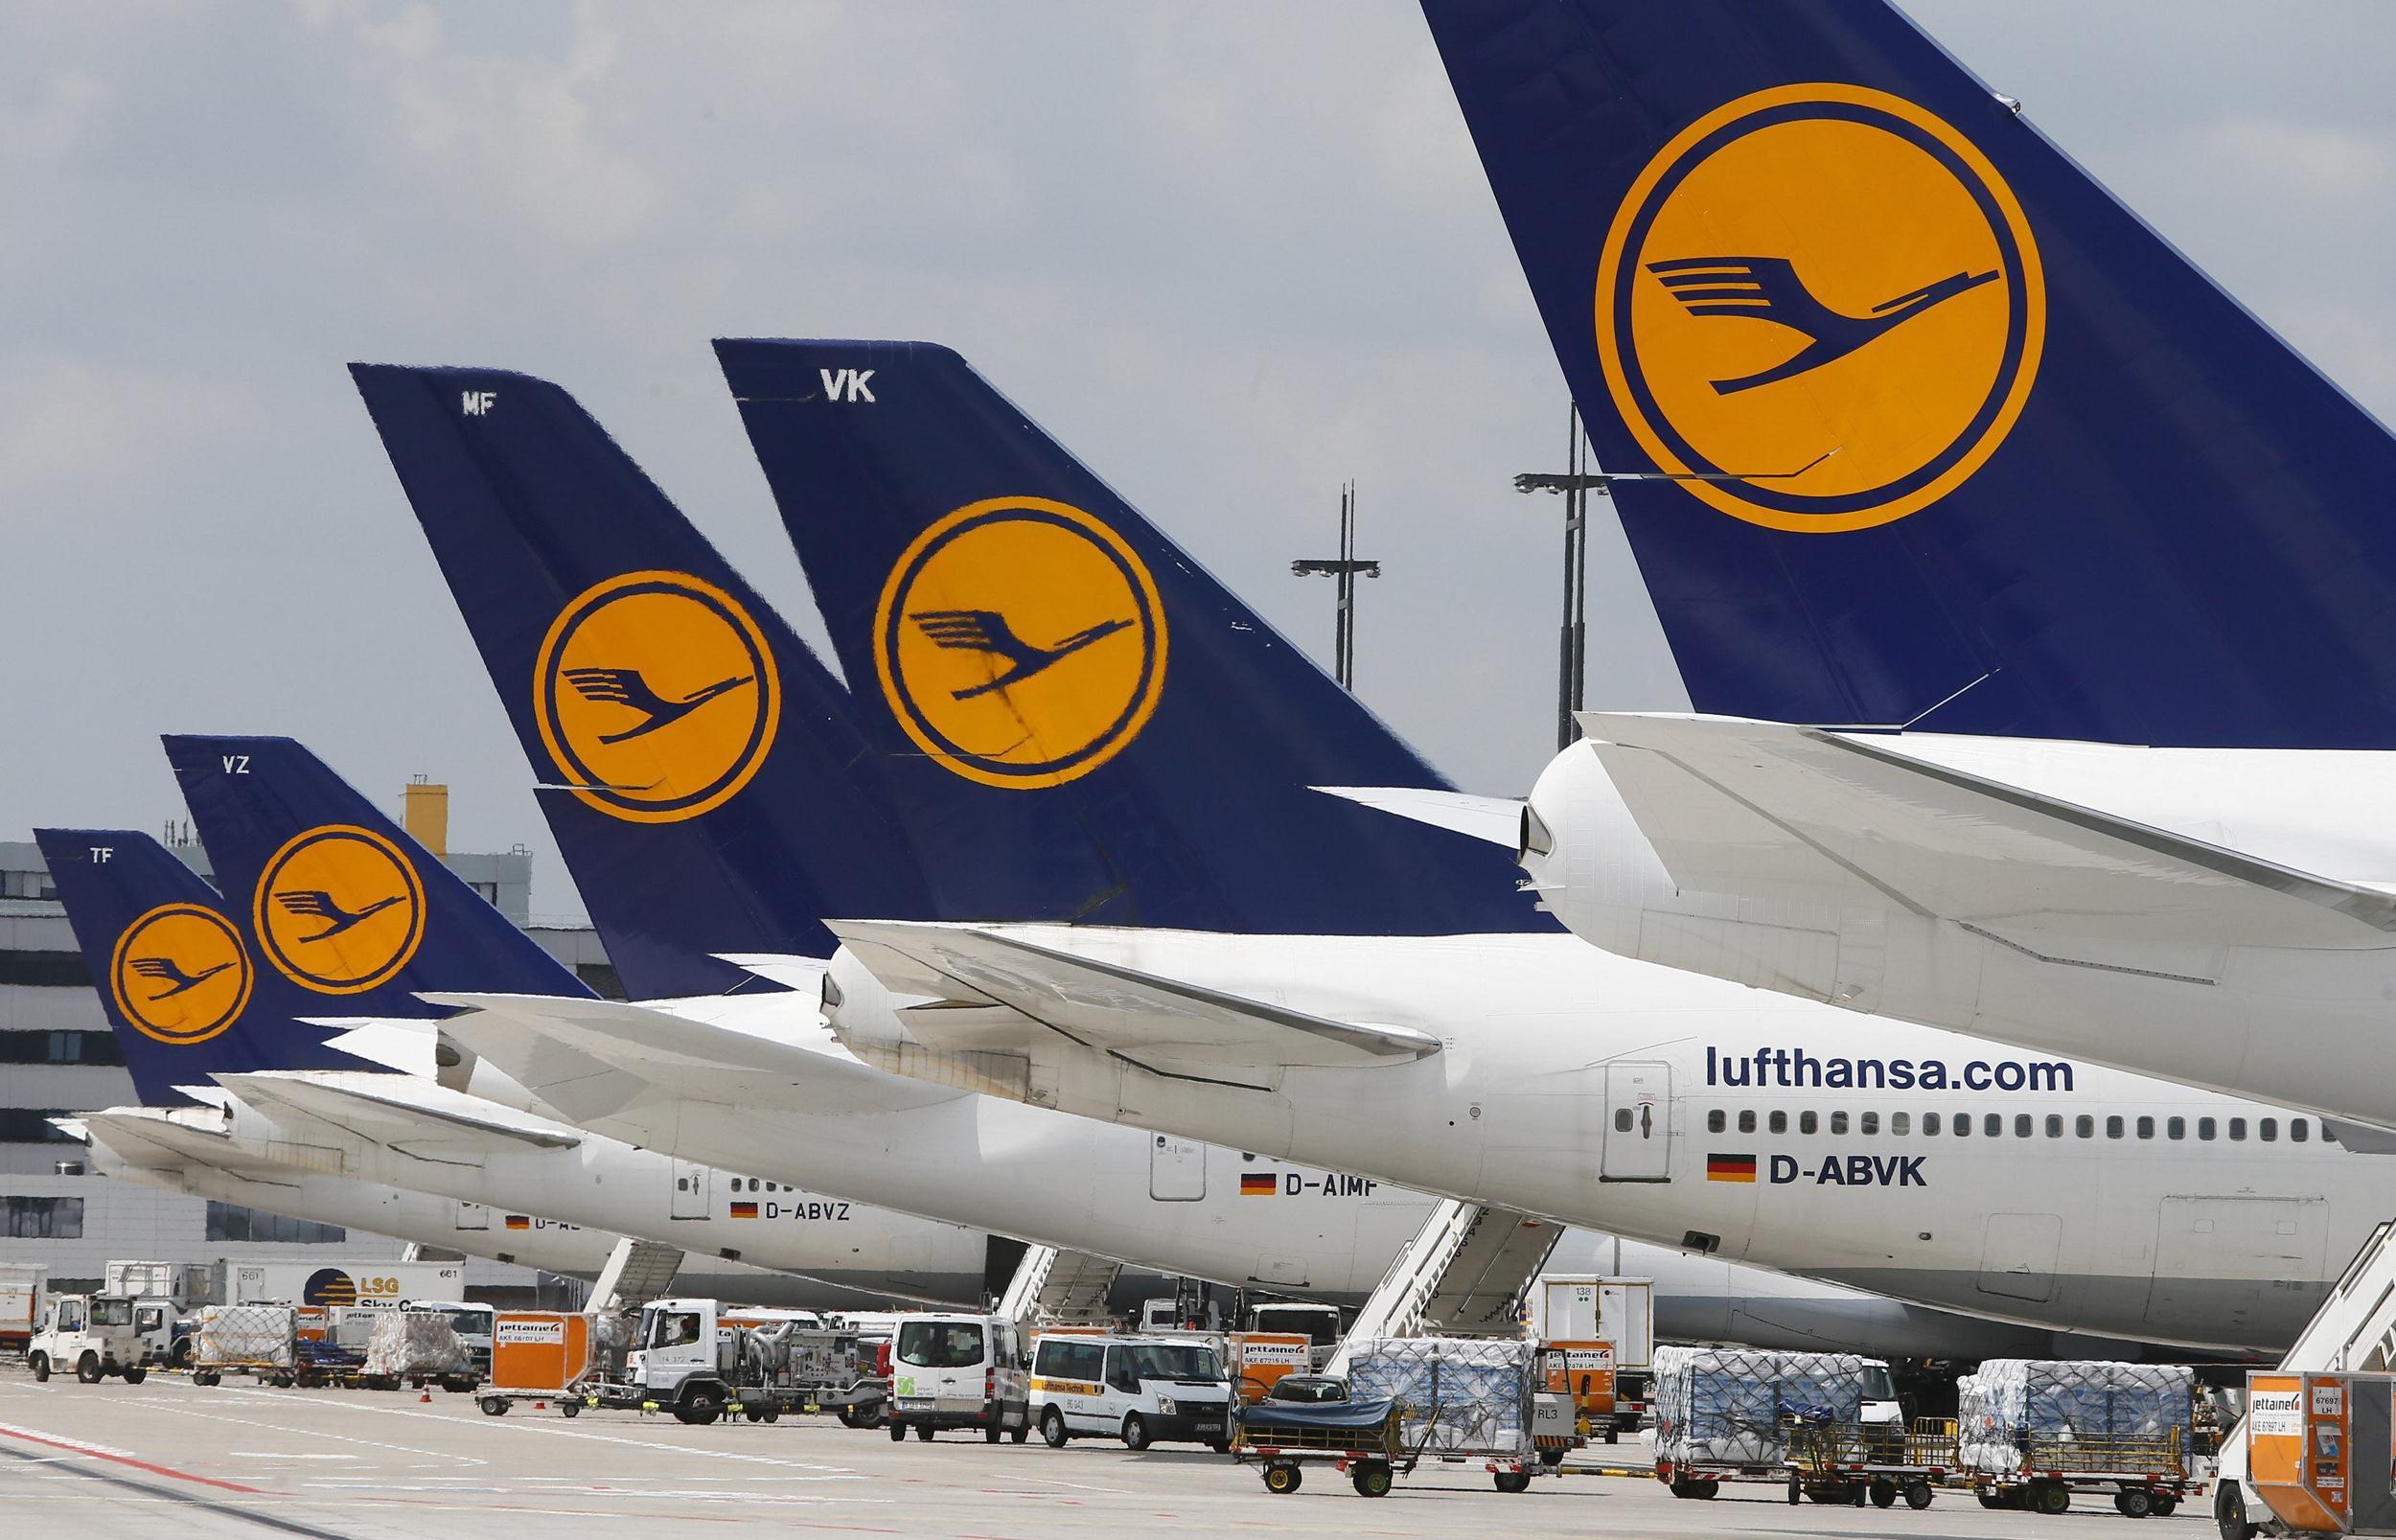 Lufthansa flight crews strike 290 flights canceled 15 for Lufthansa direct flights to germany